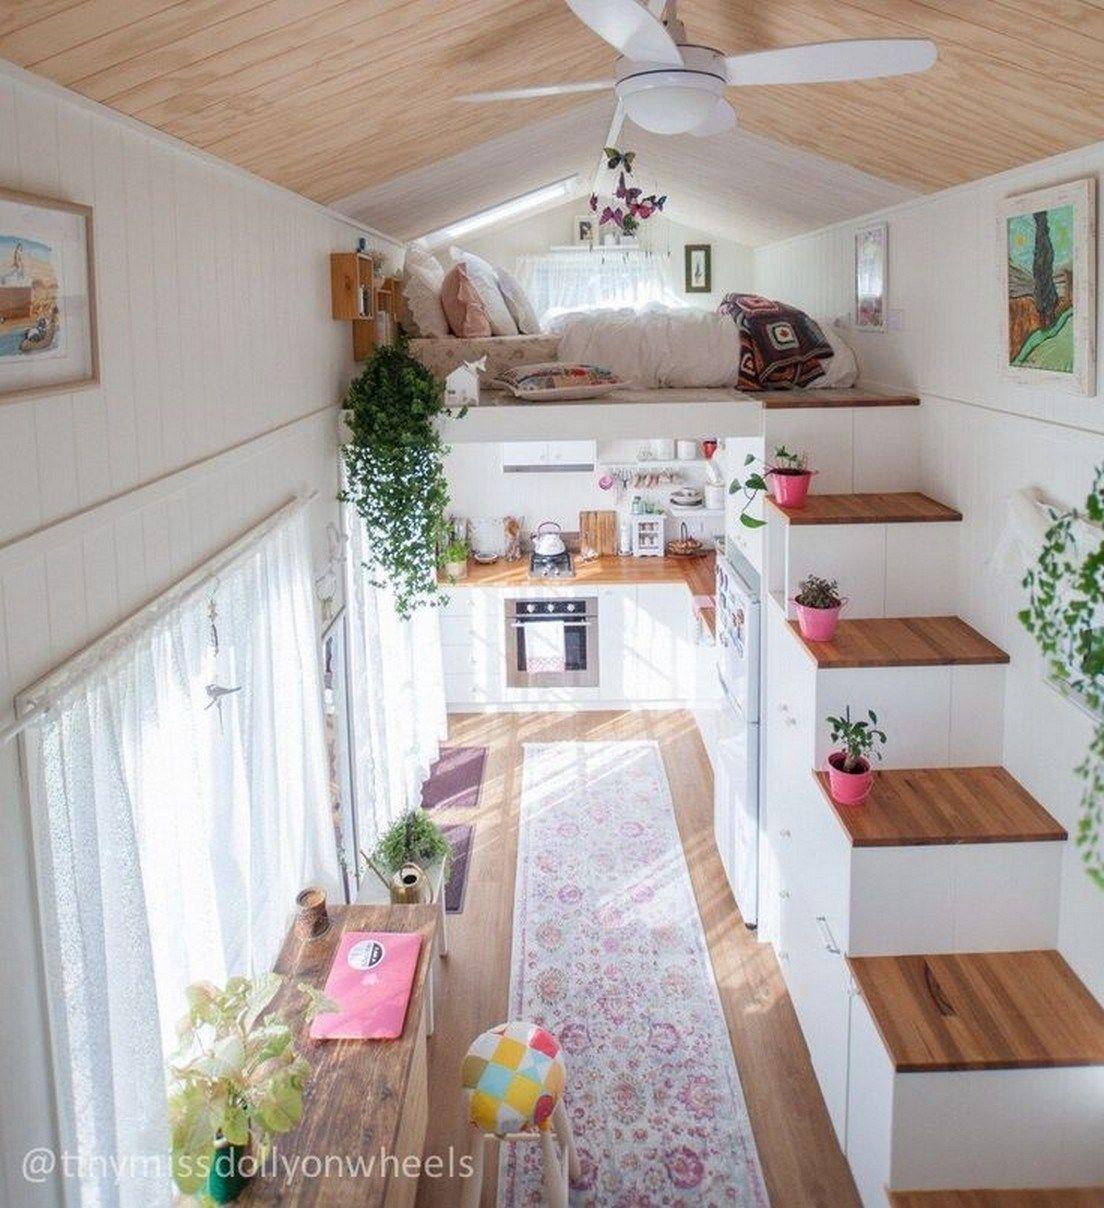 53 Cool Tiny House Design Ideas To Inspire You Fieltro Net Tiny House Inspiration Tiny House Interior Design Tiny House Living